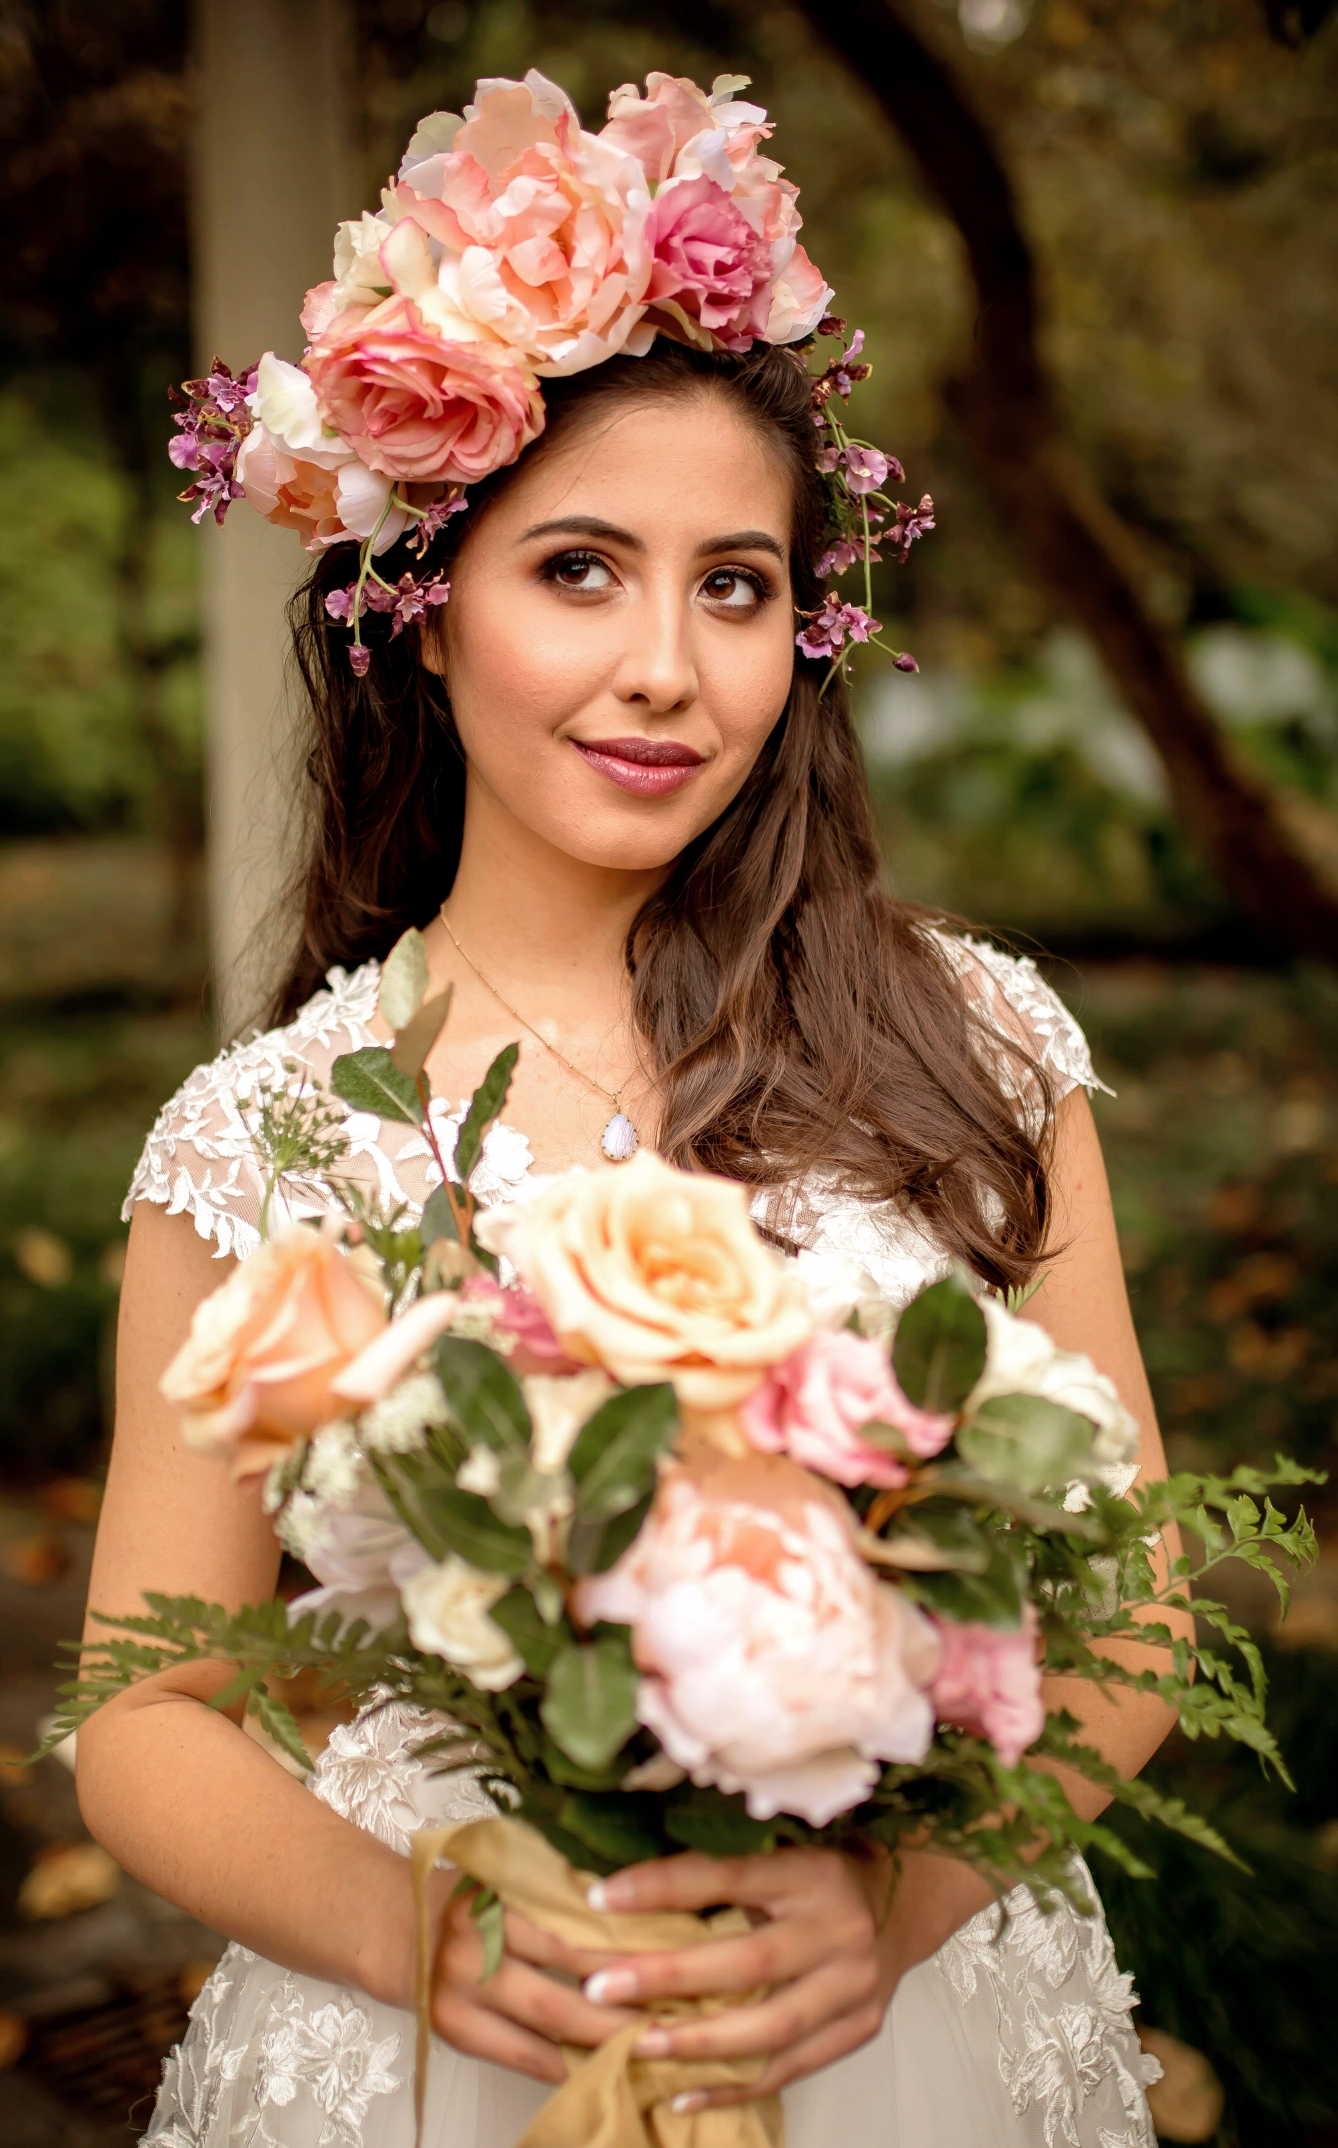 bredice-beauty-hair-makeup-flower-crown-nyc-atlanta-savannah-fashion.jpg